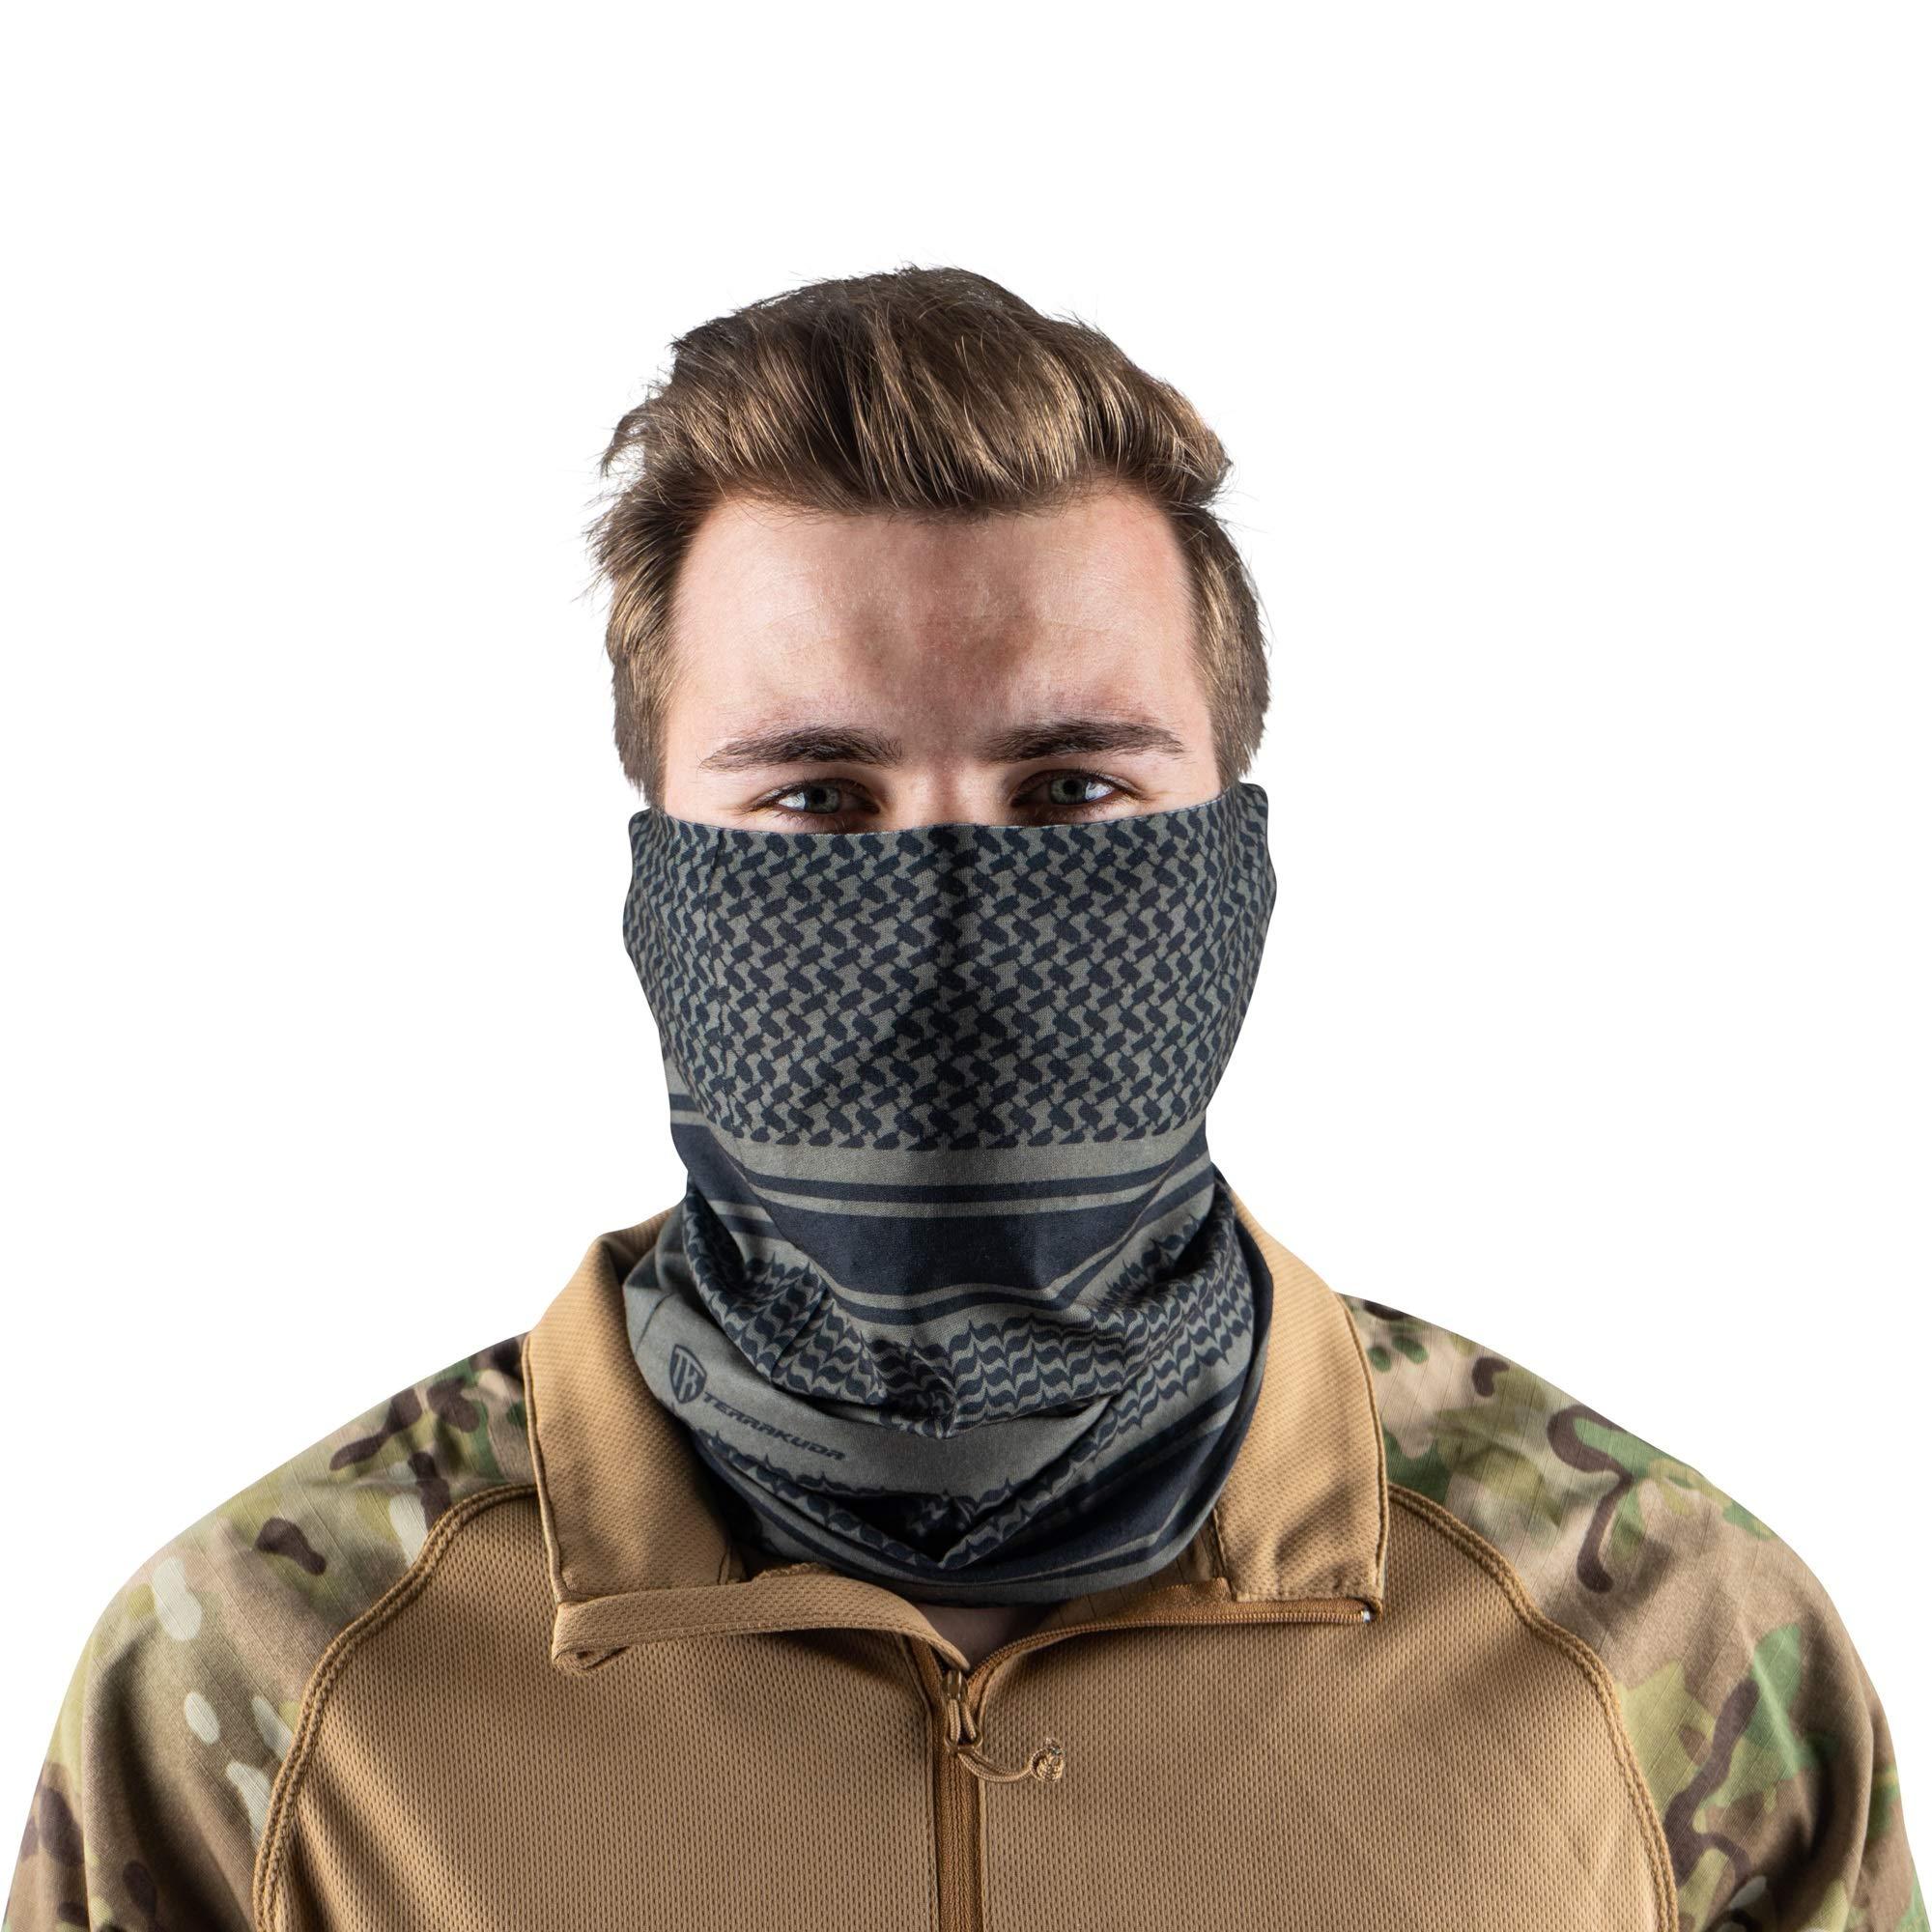 Terra Kuda Face Clothing Neck Gaiter Mask - Non Slip Light Breathable for Sun Wind Dust Bandana Balaclava (Green Shemagh) by Terra Kuda